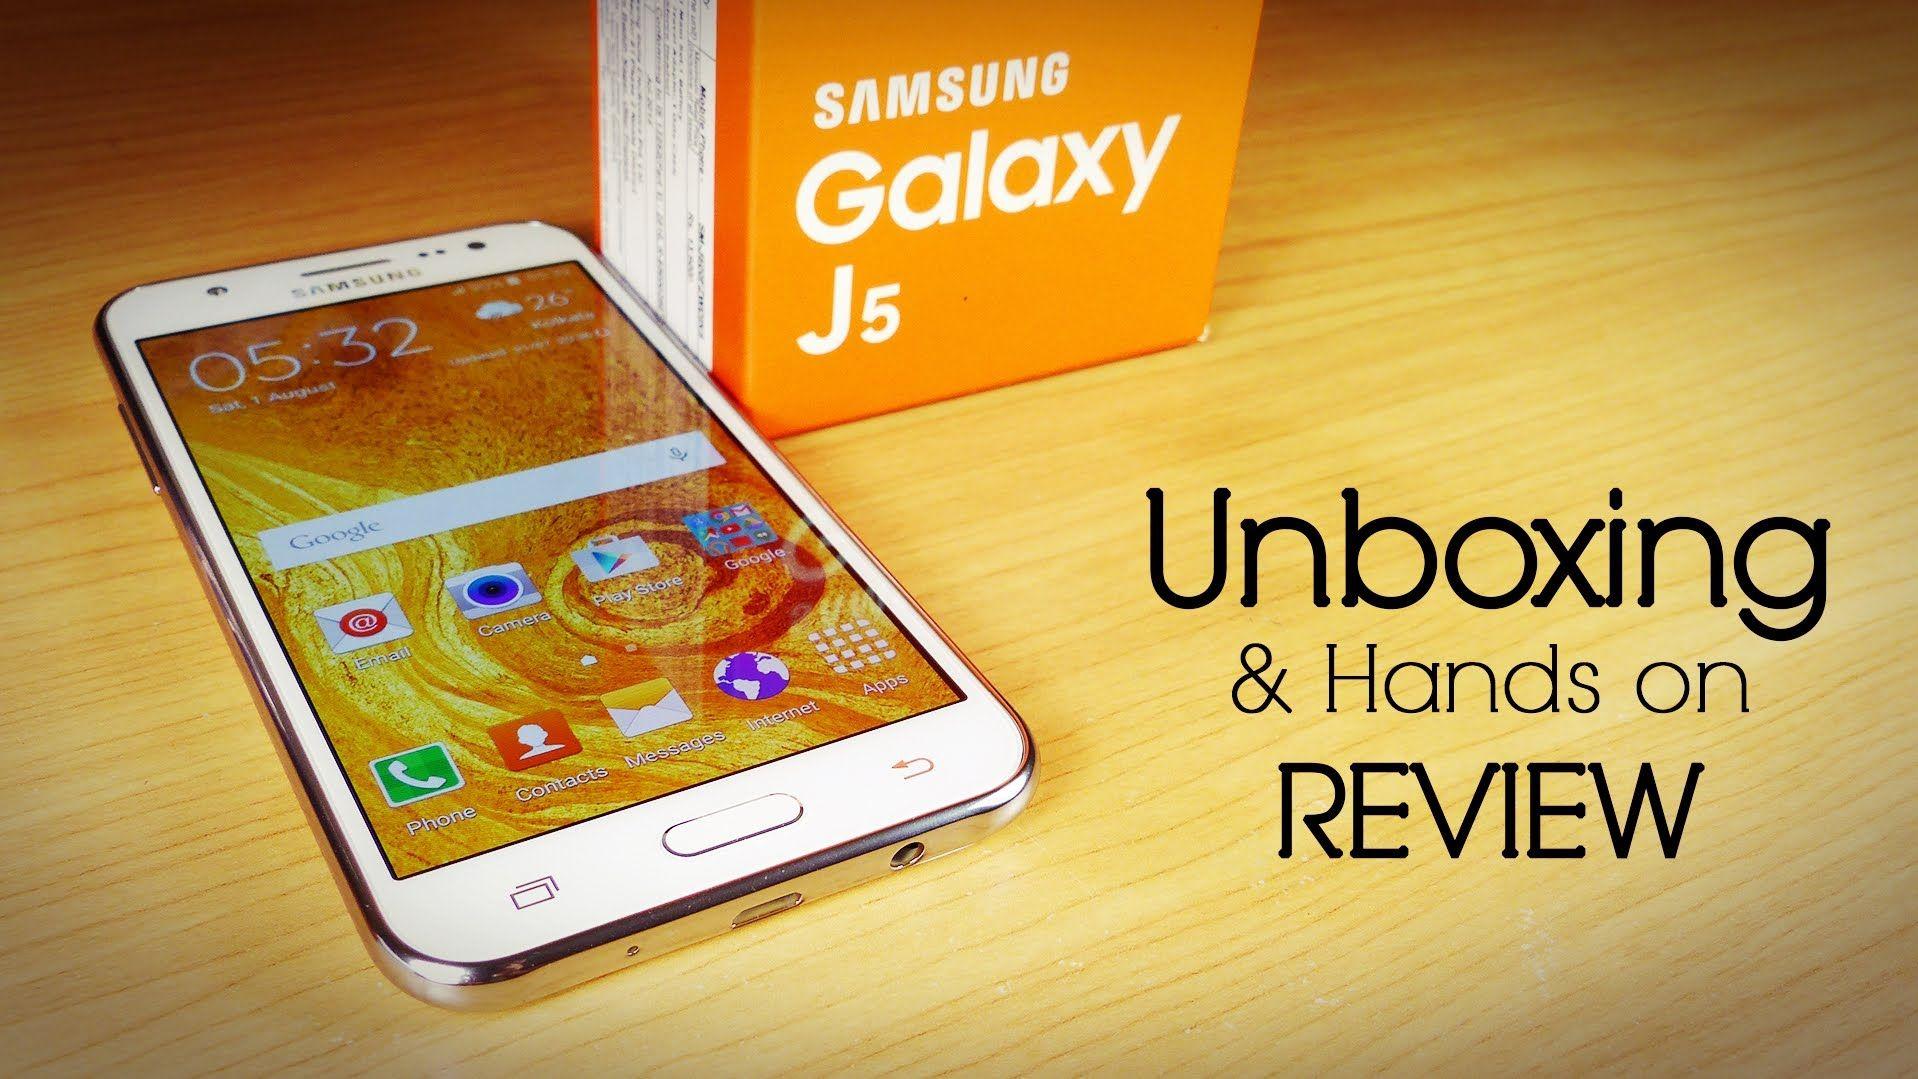 Spesifikasi dan Harga Samsung Galaxy J5 Juli 2016, Samsung